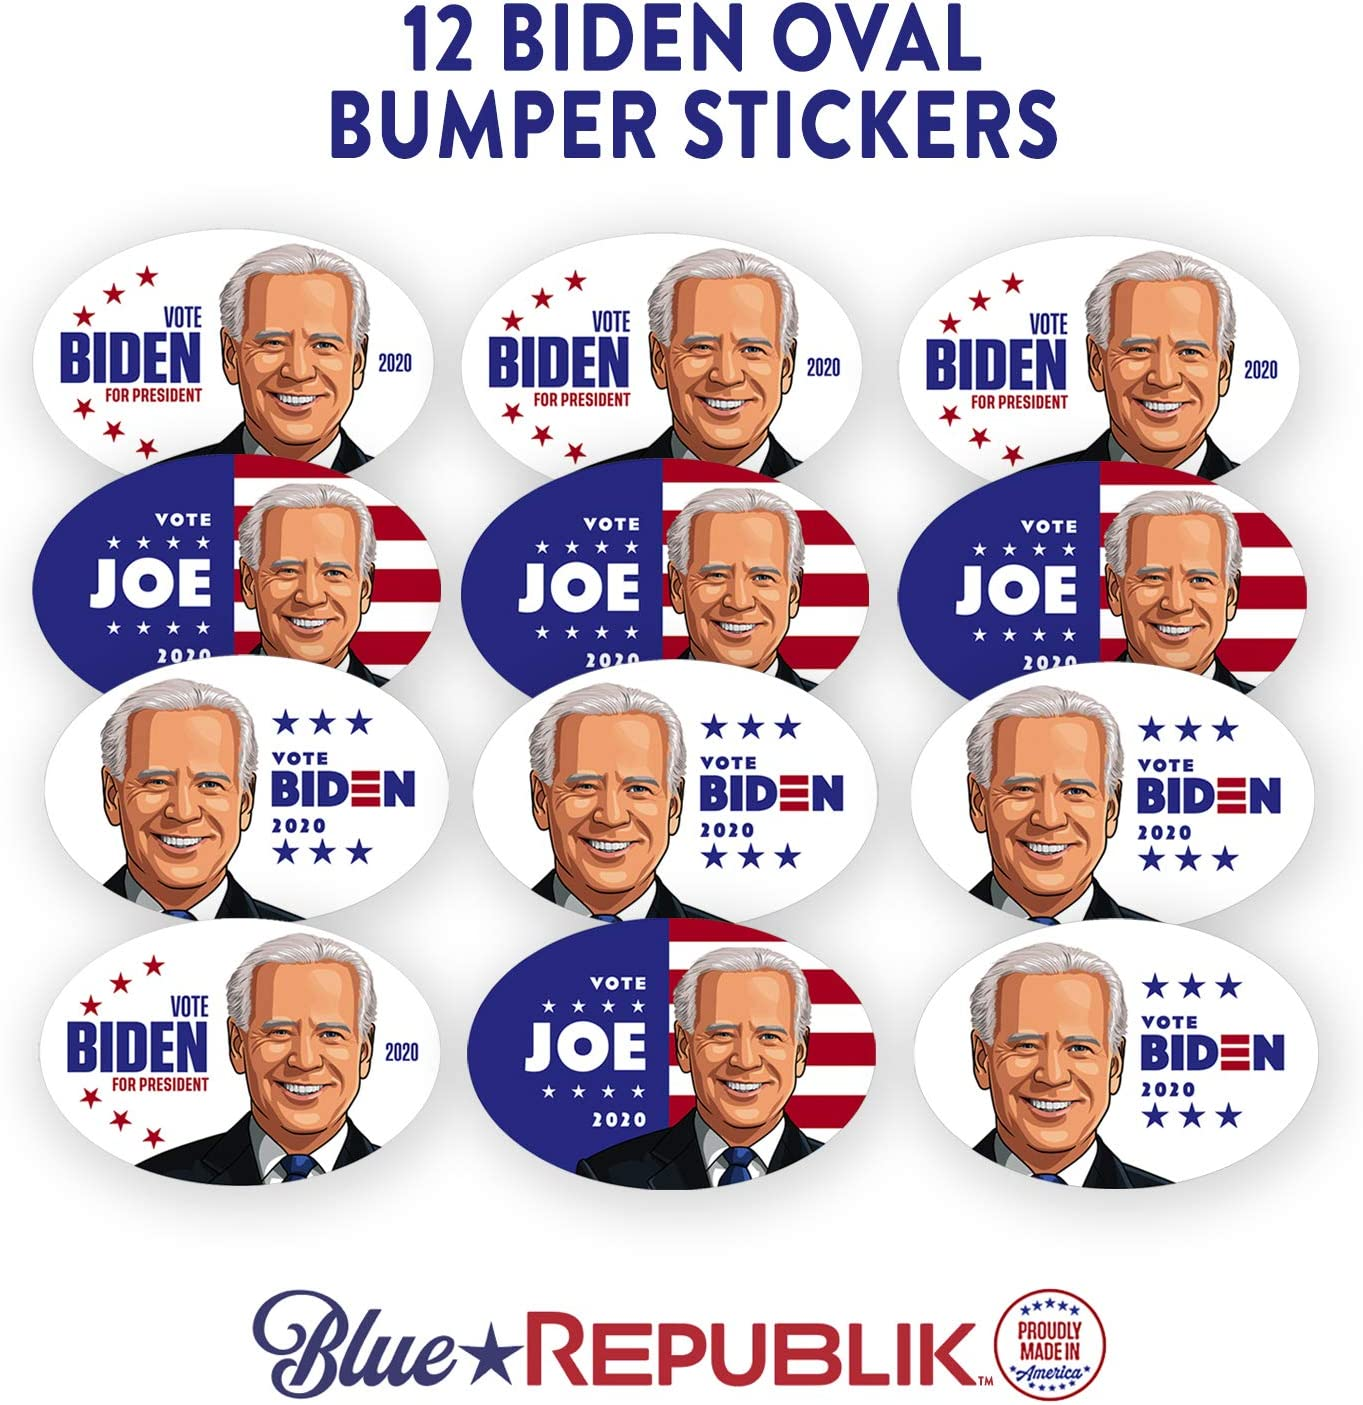 12 Pack 4 x 6 Ovals Professionally Printed in USA with Weather Resistant UV Inks. Elizabeth Warren Sticker for 2020 Election BlueRepublik Warren 2020 Bumper Sticker